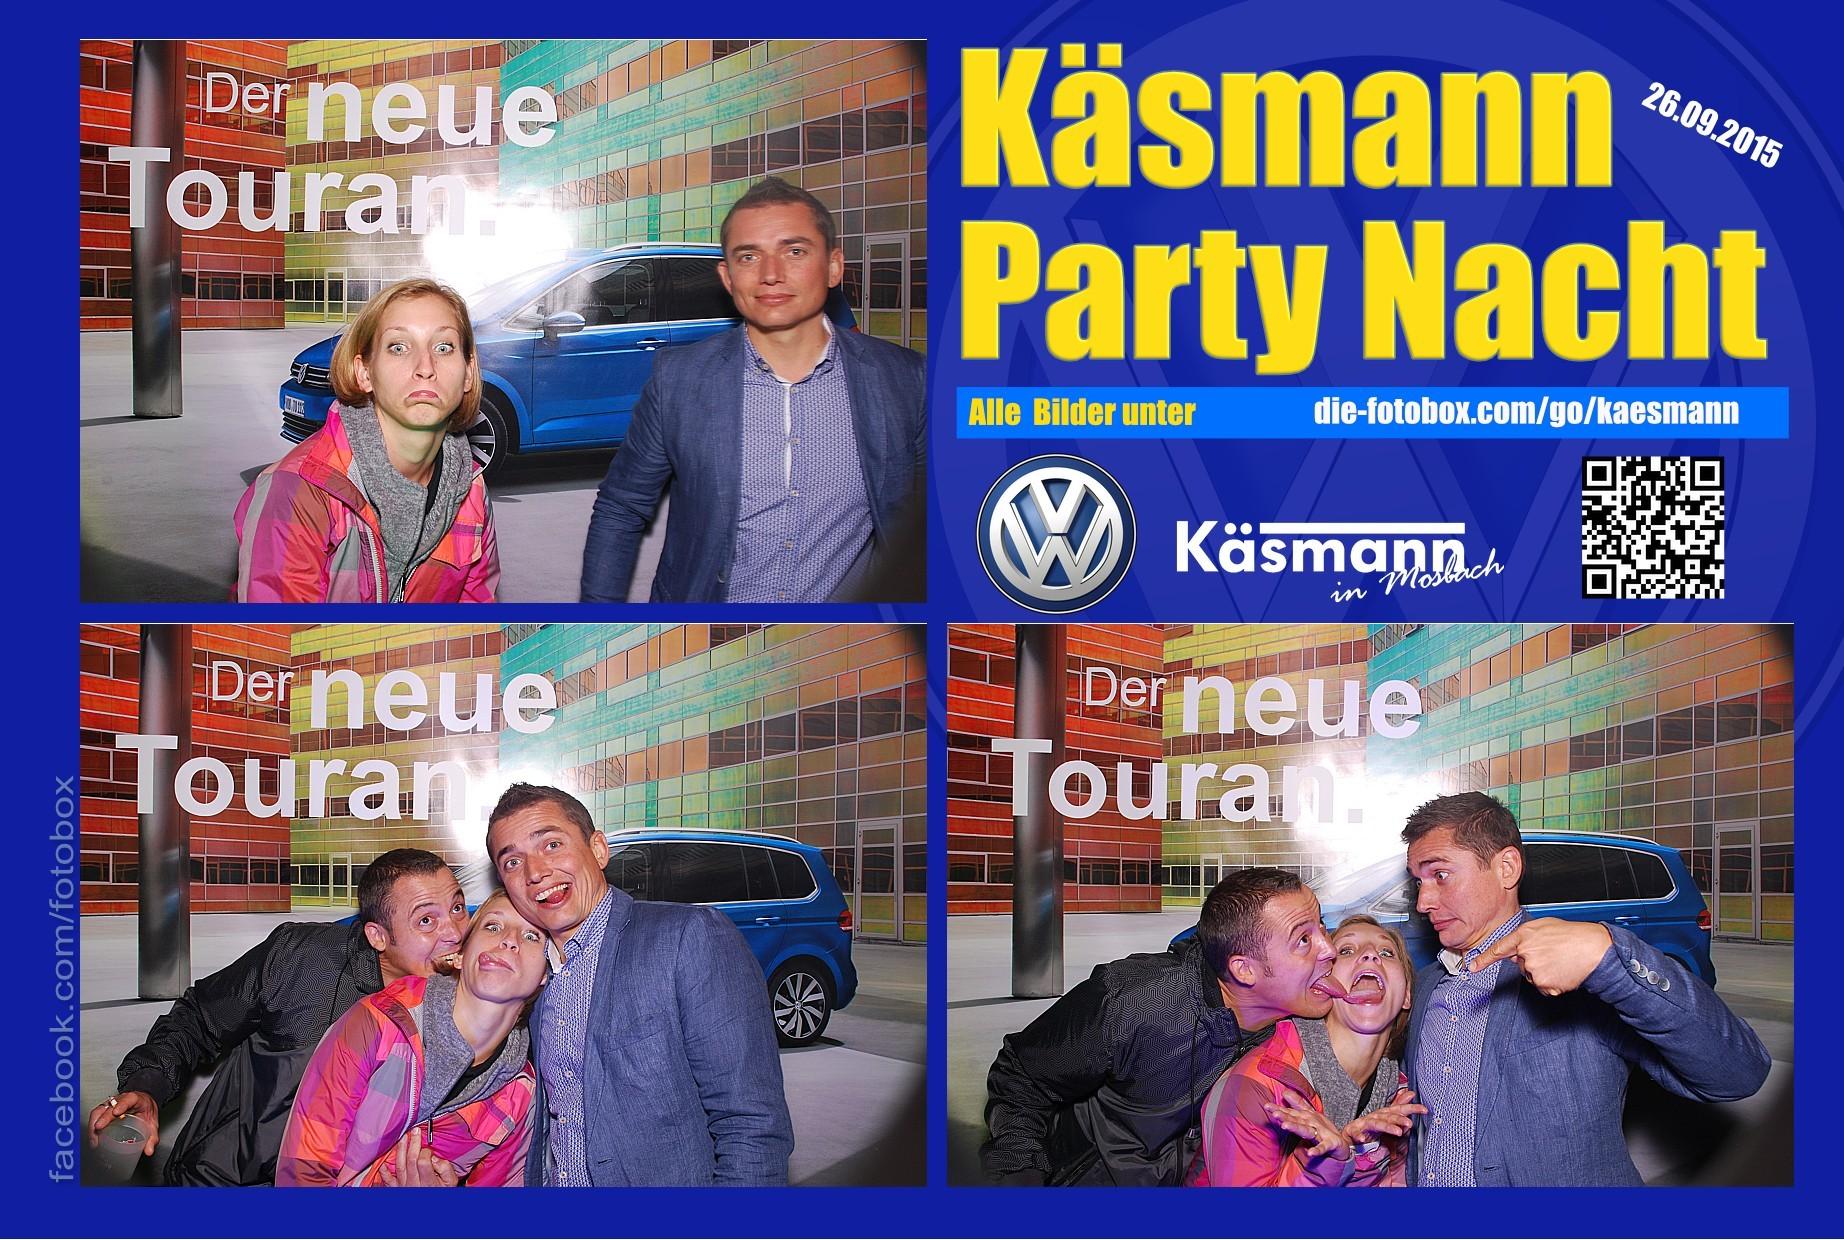 Käsmannparty 2015 - www.die-fotobox.com 01264